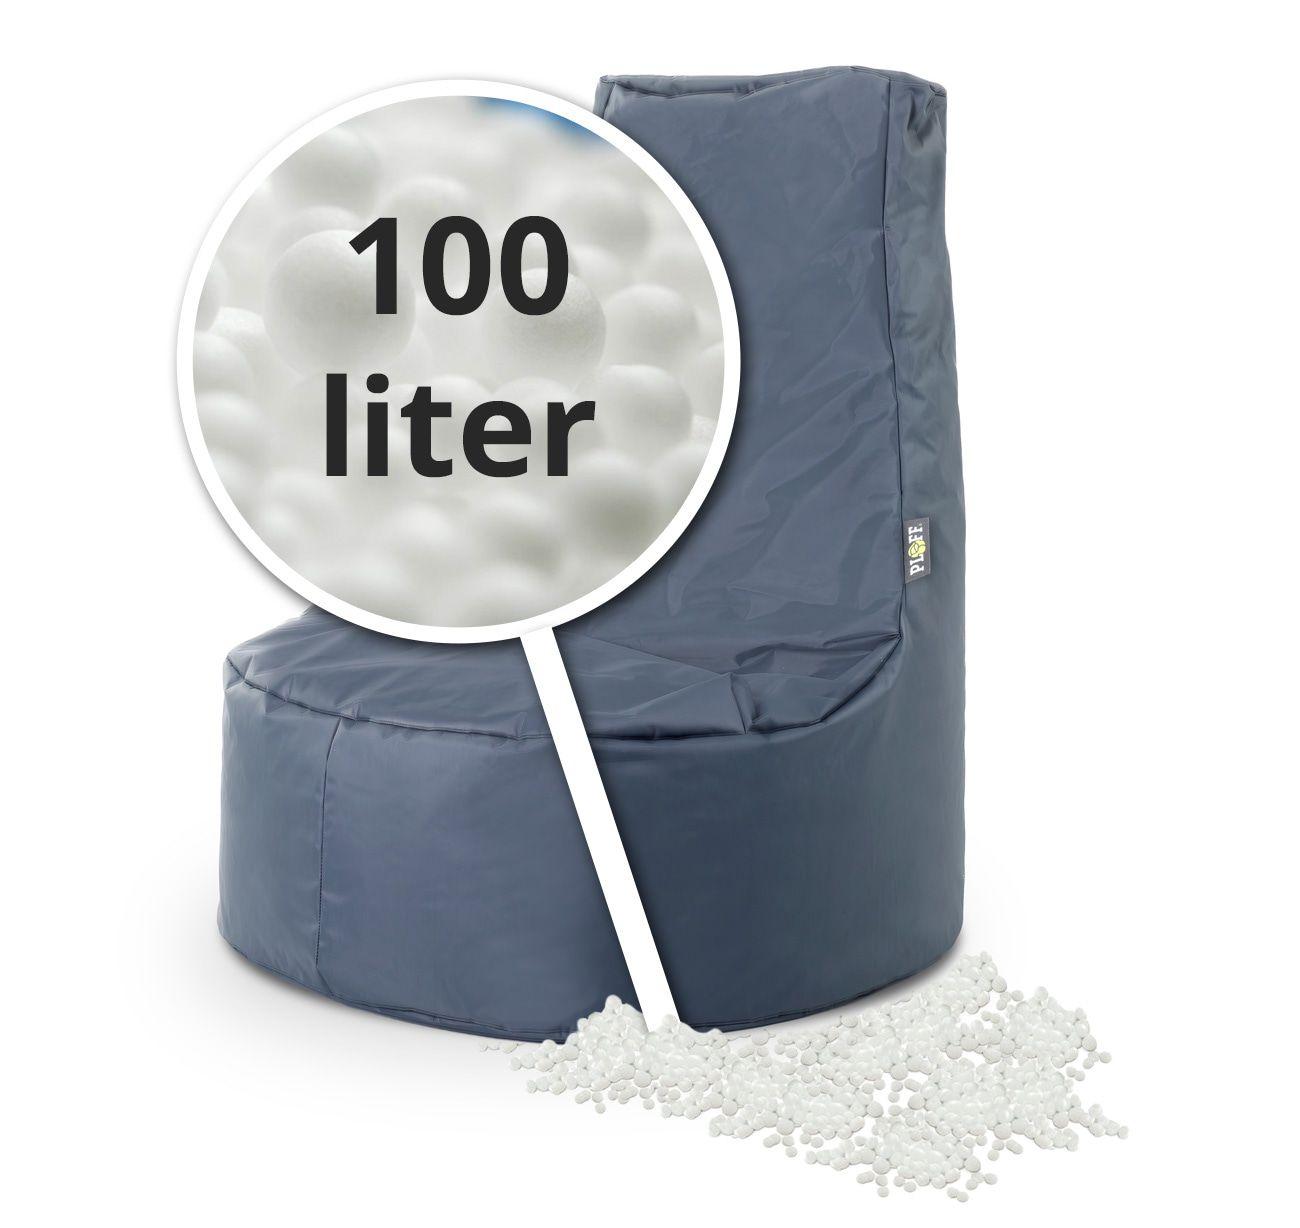 EPS Zitzak Navulling 100 liter